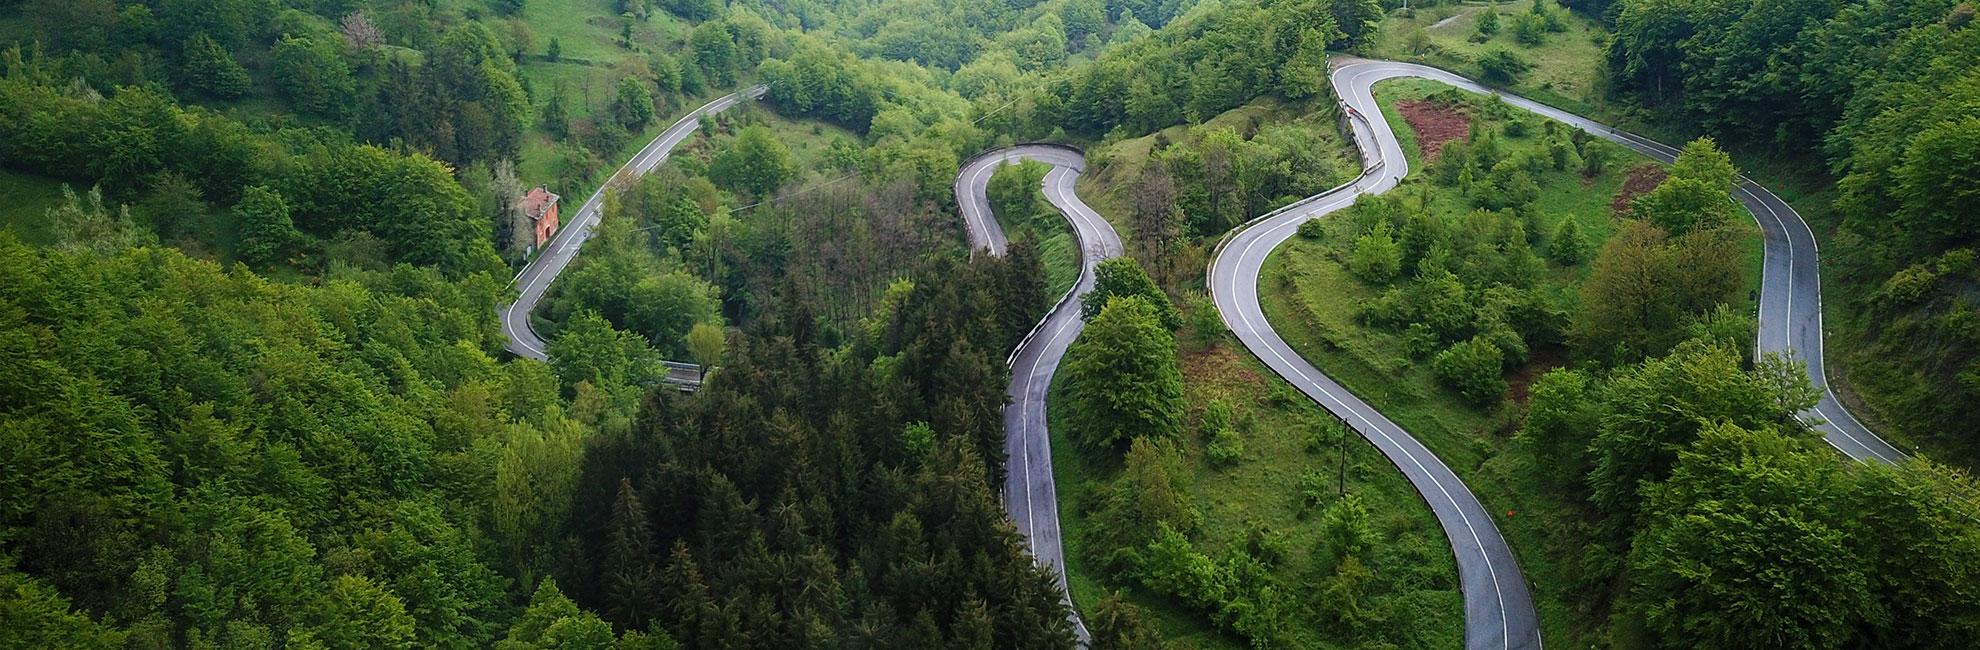 EDELWEISS BIKE TRAVEL | Motorcycle Tours Worldwide